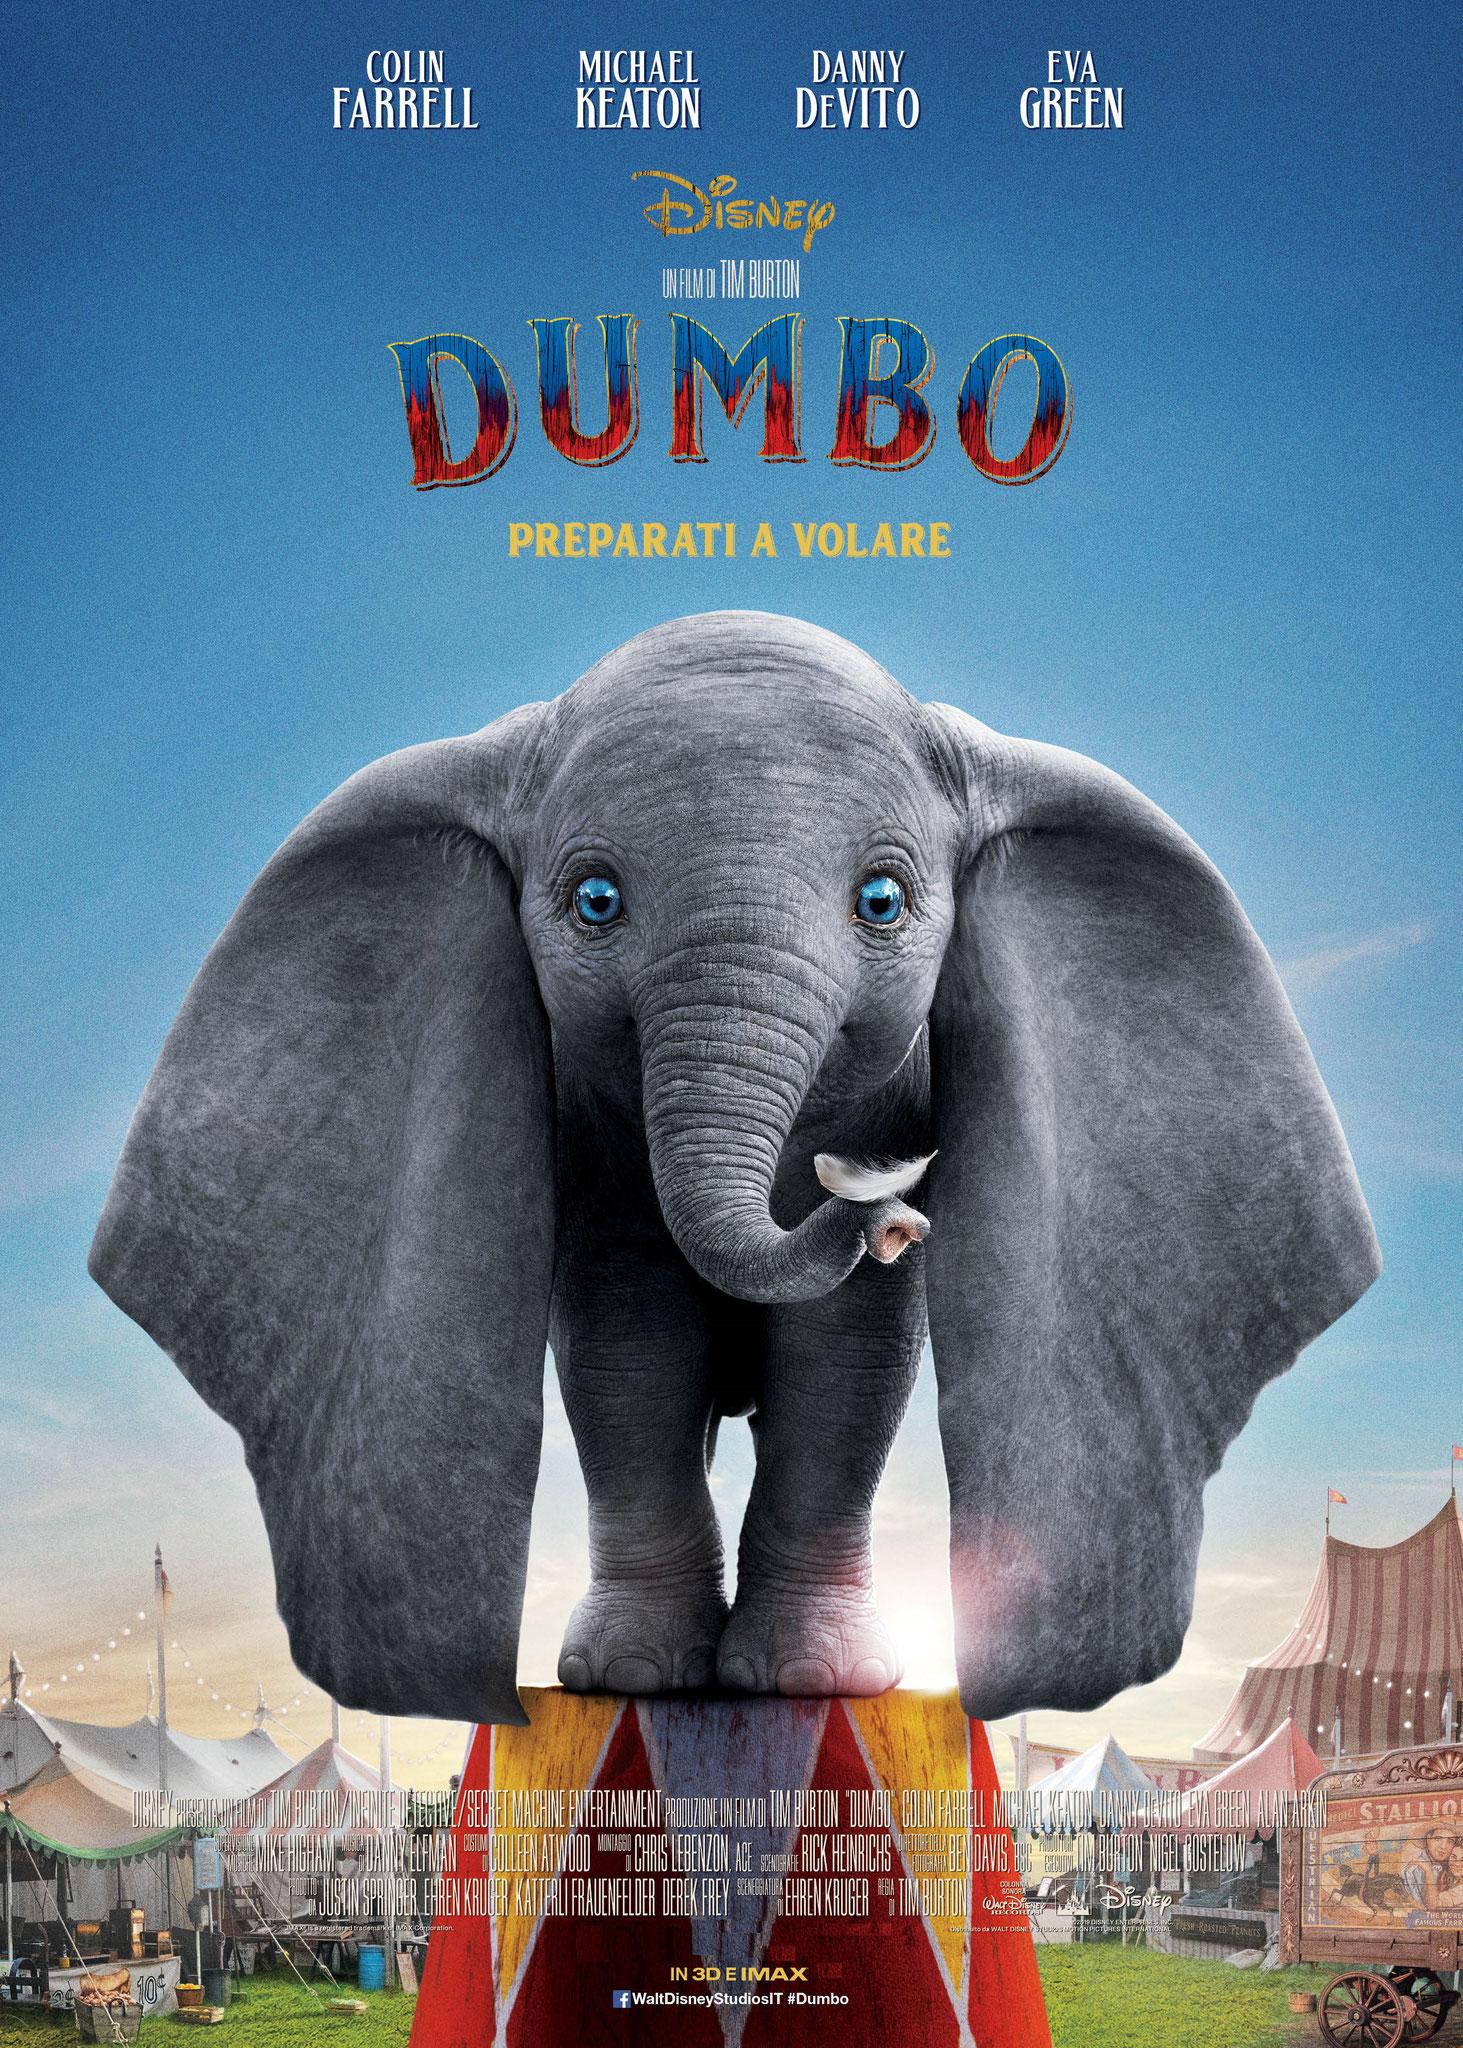 DUMBO Giovedì 4 e venerdì 5: ore 21:15 Sabato 6 e domenica 7: ore 18:30 - 21:15 #Dumbo